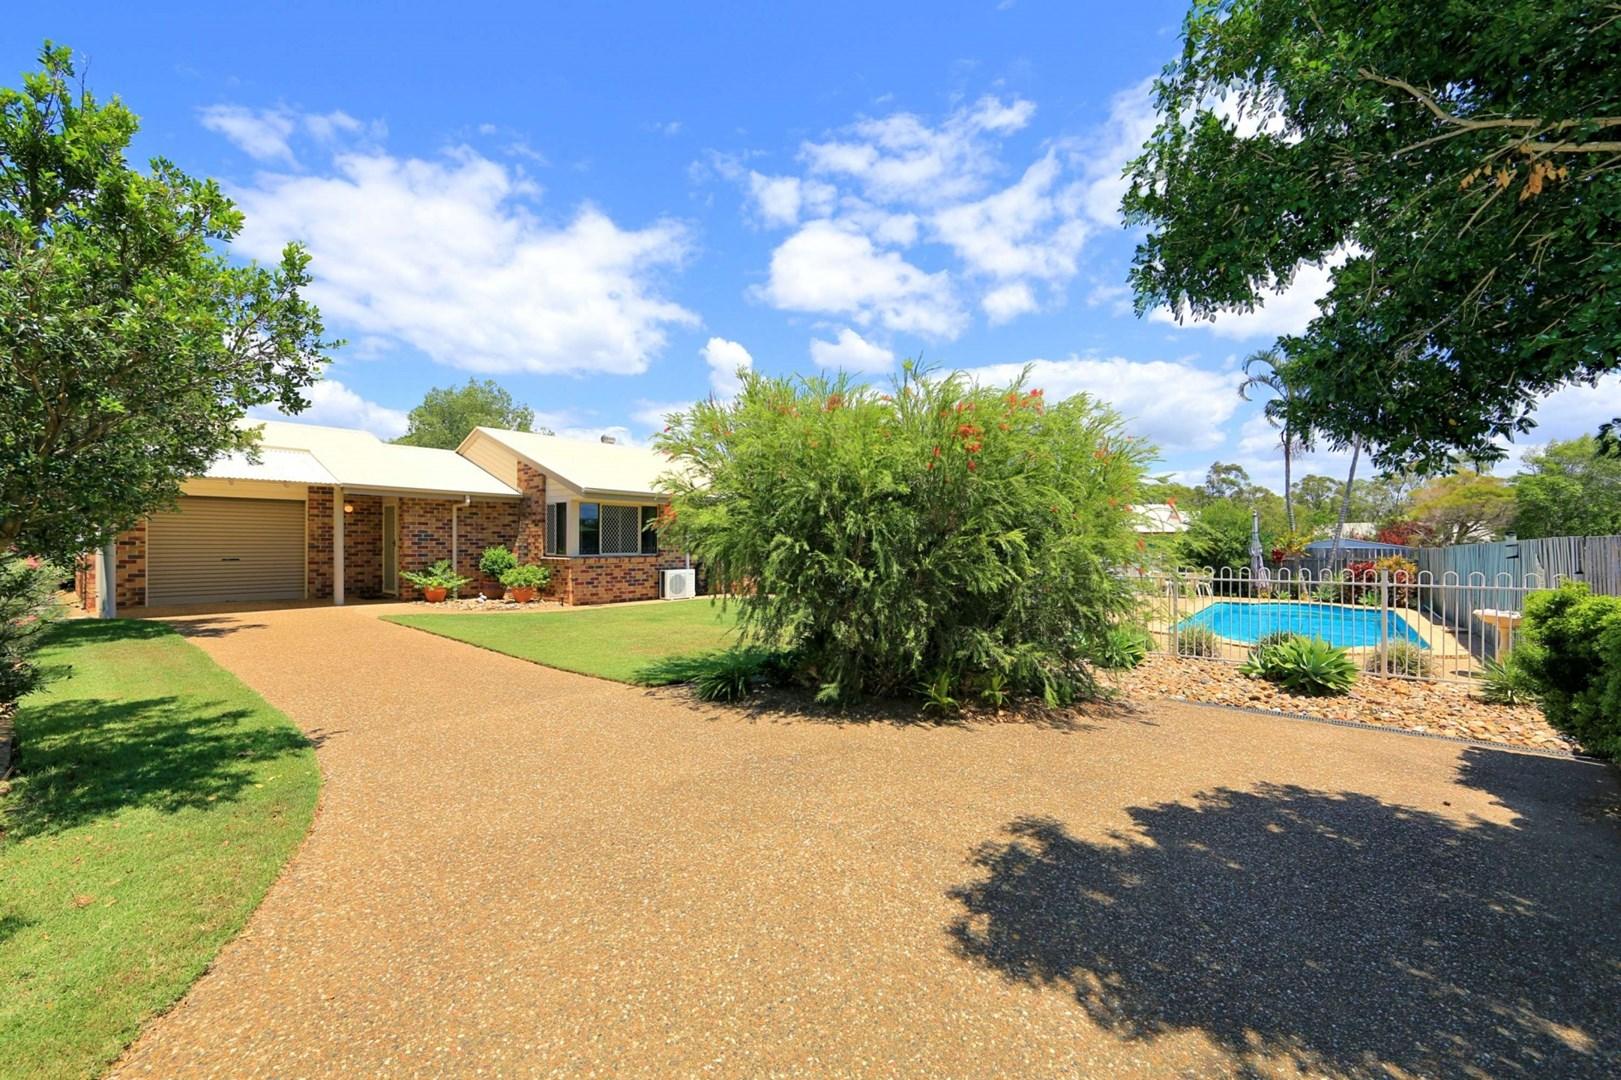 One Agency Bundaberg And Bargara Real Estate Agency In Bargara Qld 4670